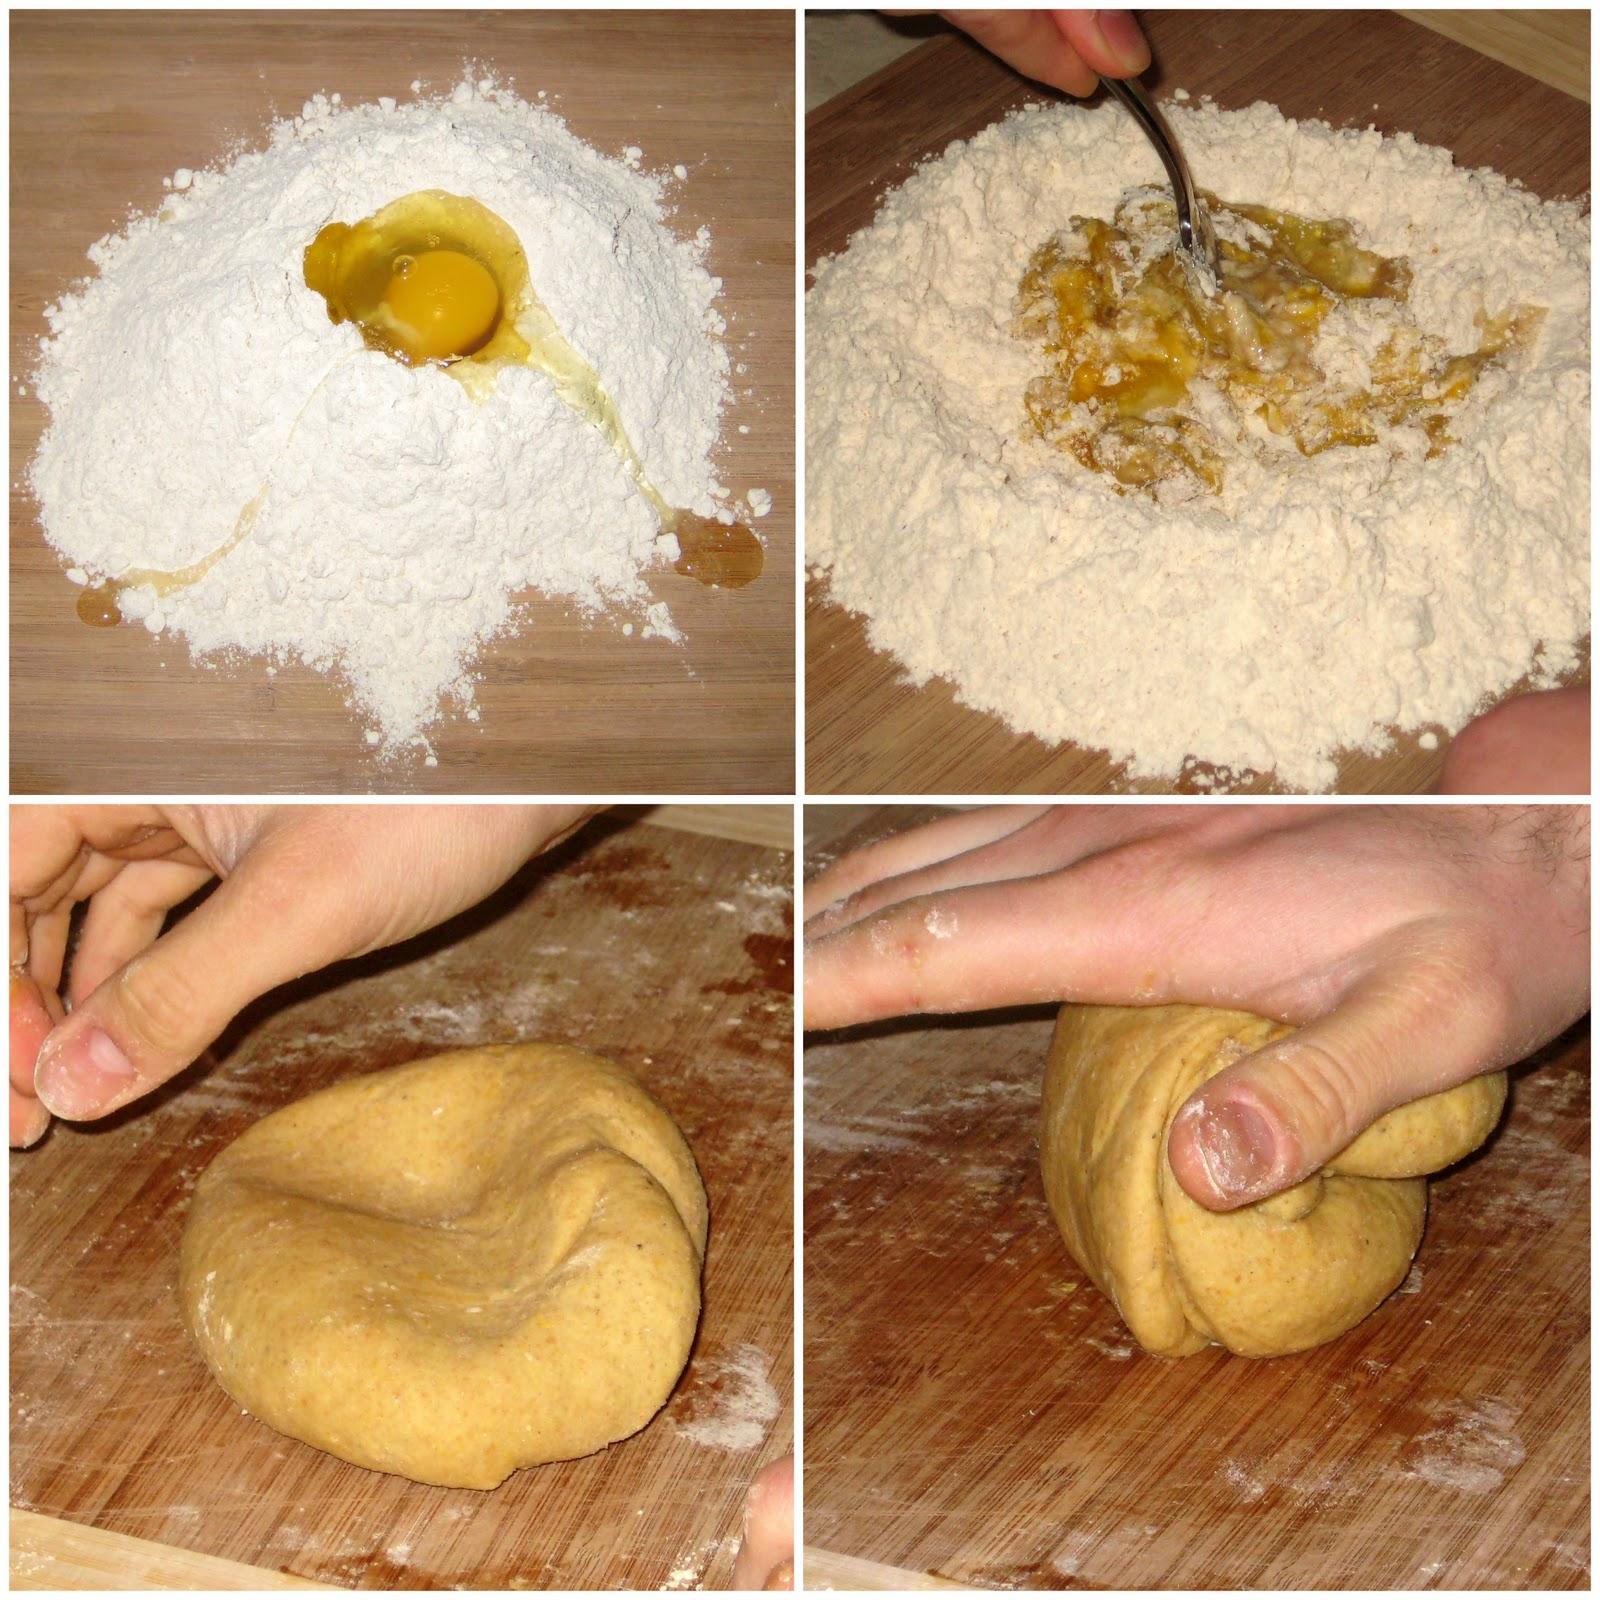 Homemade multigrain pasta recipes